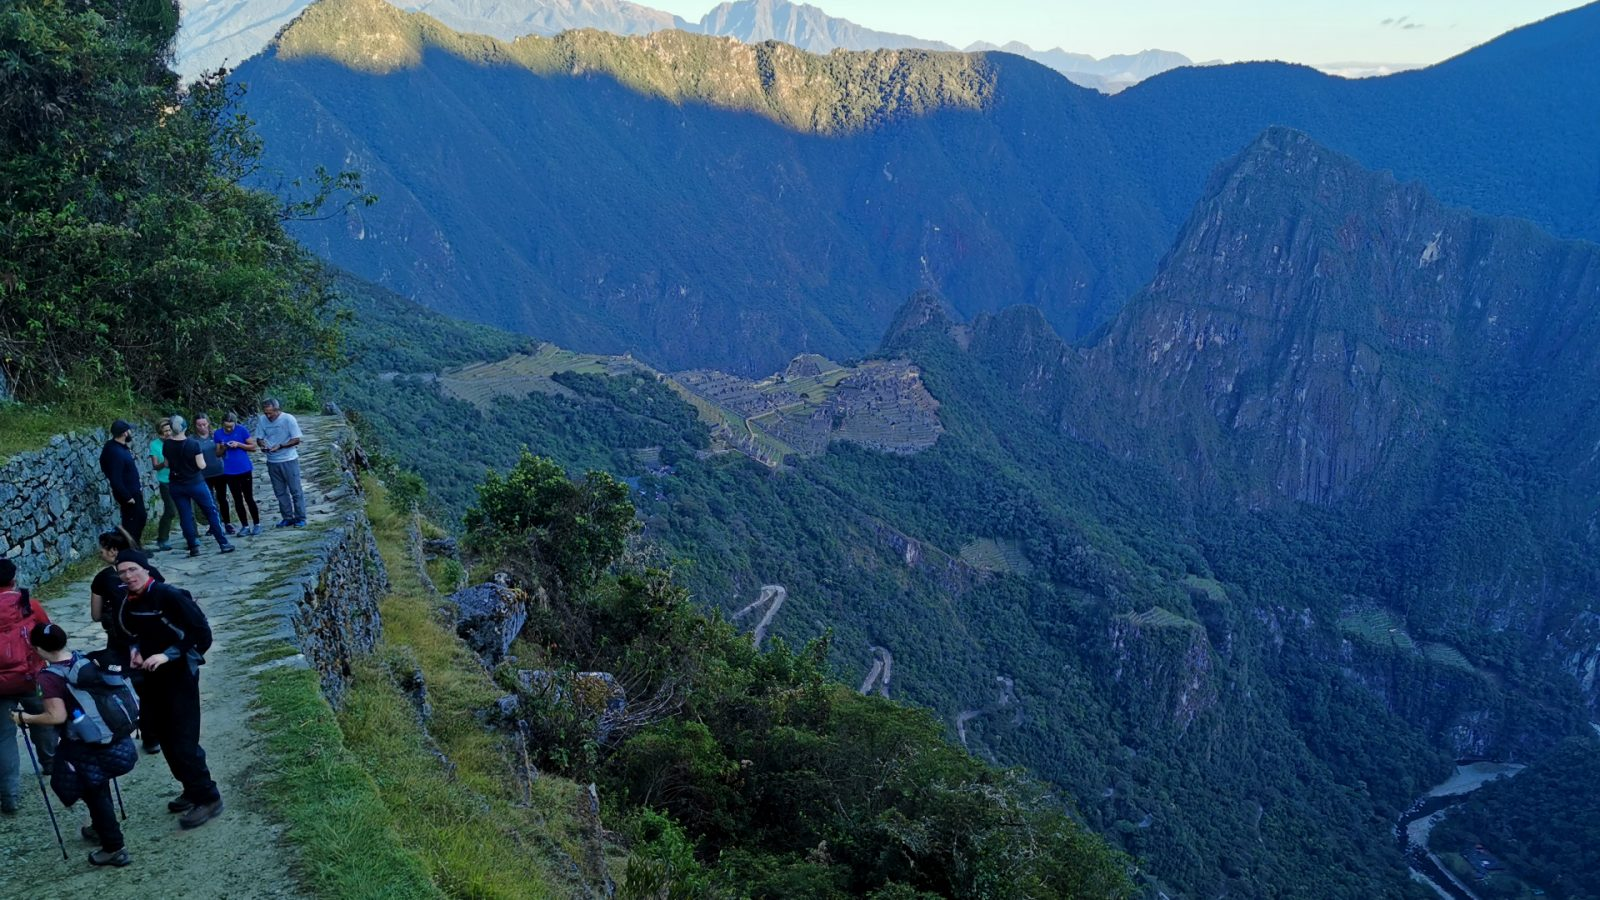 SUN GATE of Machu Picchu by Inka Trail Trek